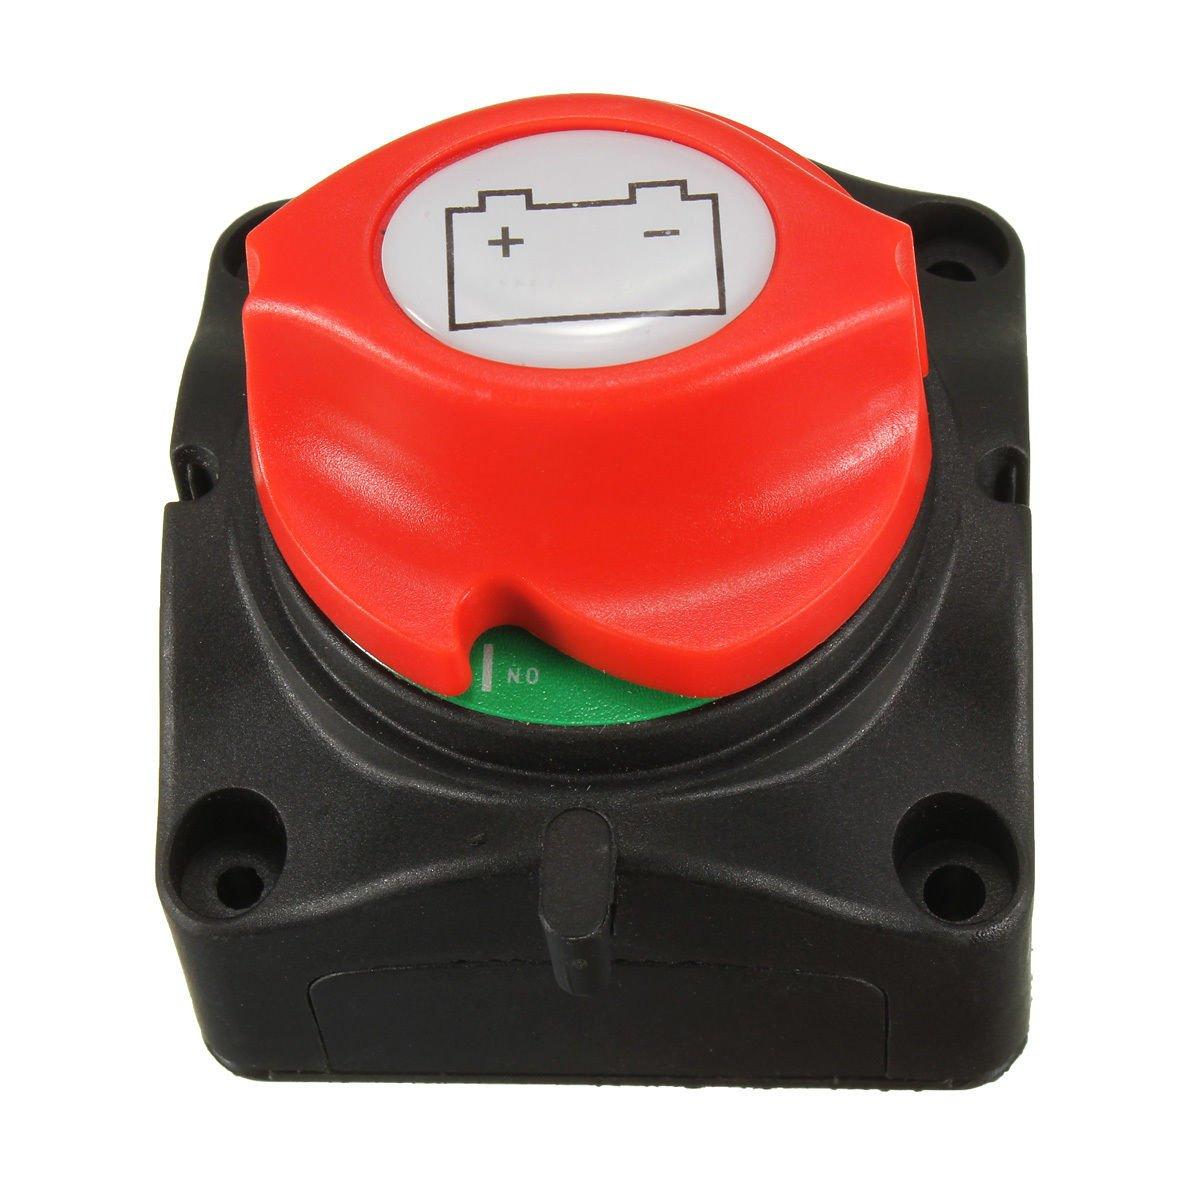 nuzamas Marine herausnehmbare Batterie Trennschalter Cut Off Power Schalter auf off 12 V/24 V fü r Auto 4 WD RV ATV Fahrzeuge Boote